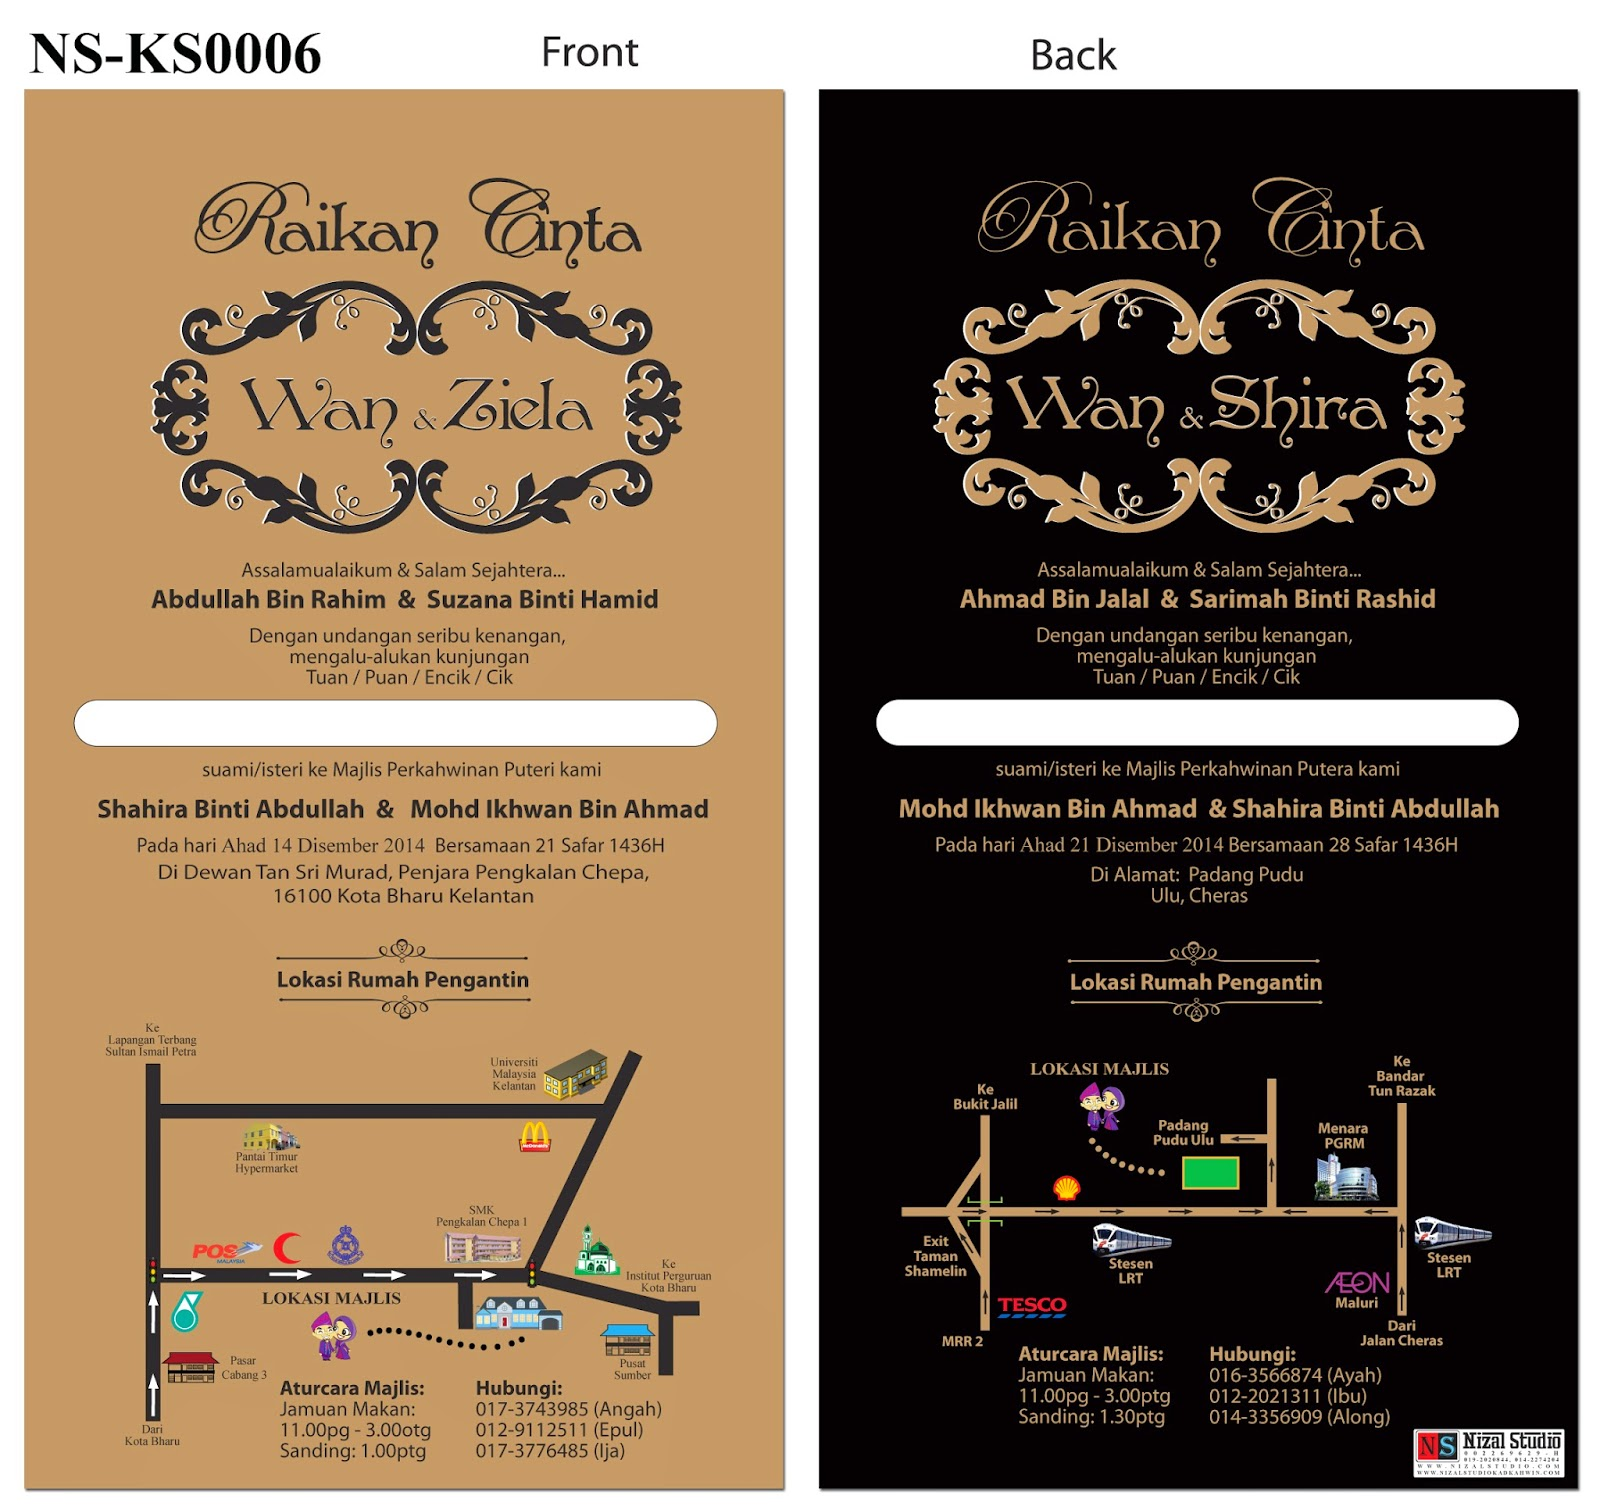 Nizal Studio Hq 002269629 H Kad Kahwin Bajet